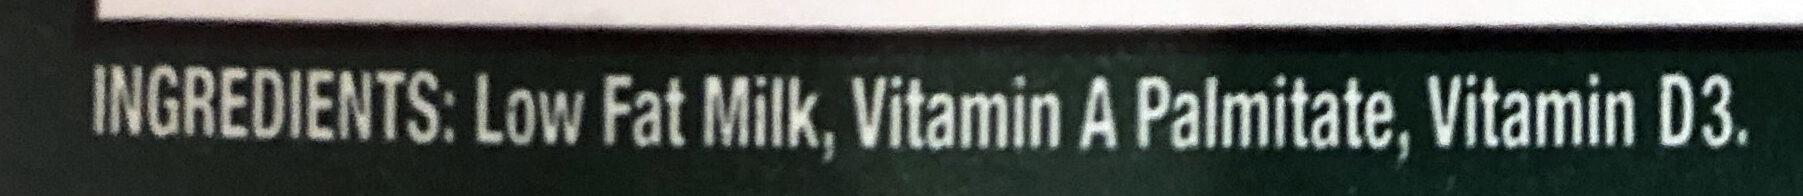 Low Fat Milk - Ingredients - en